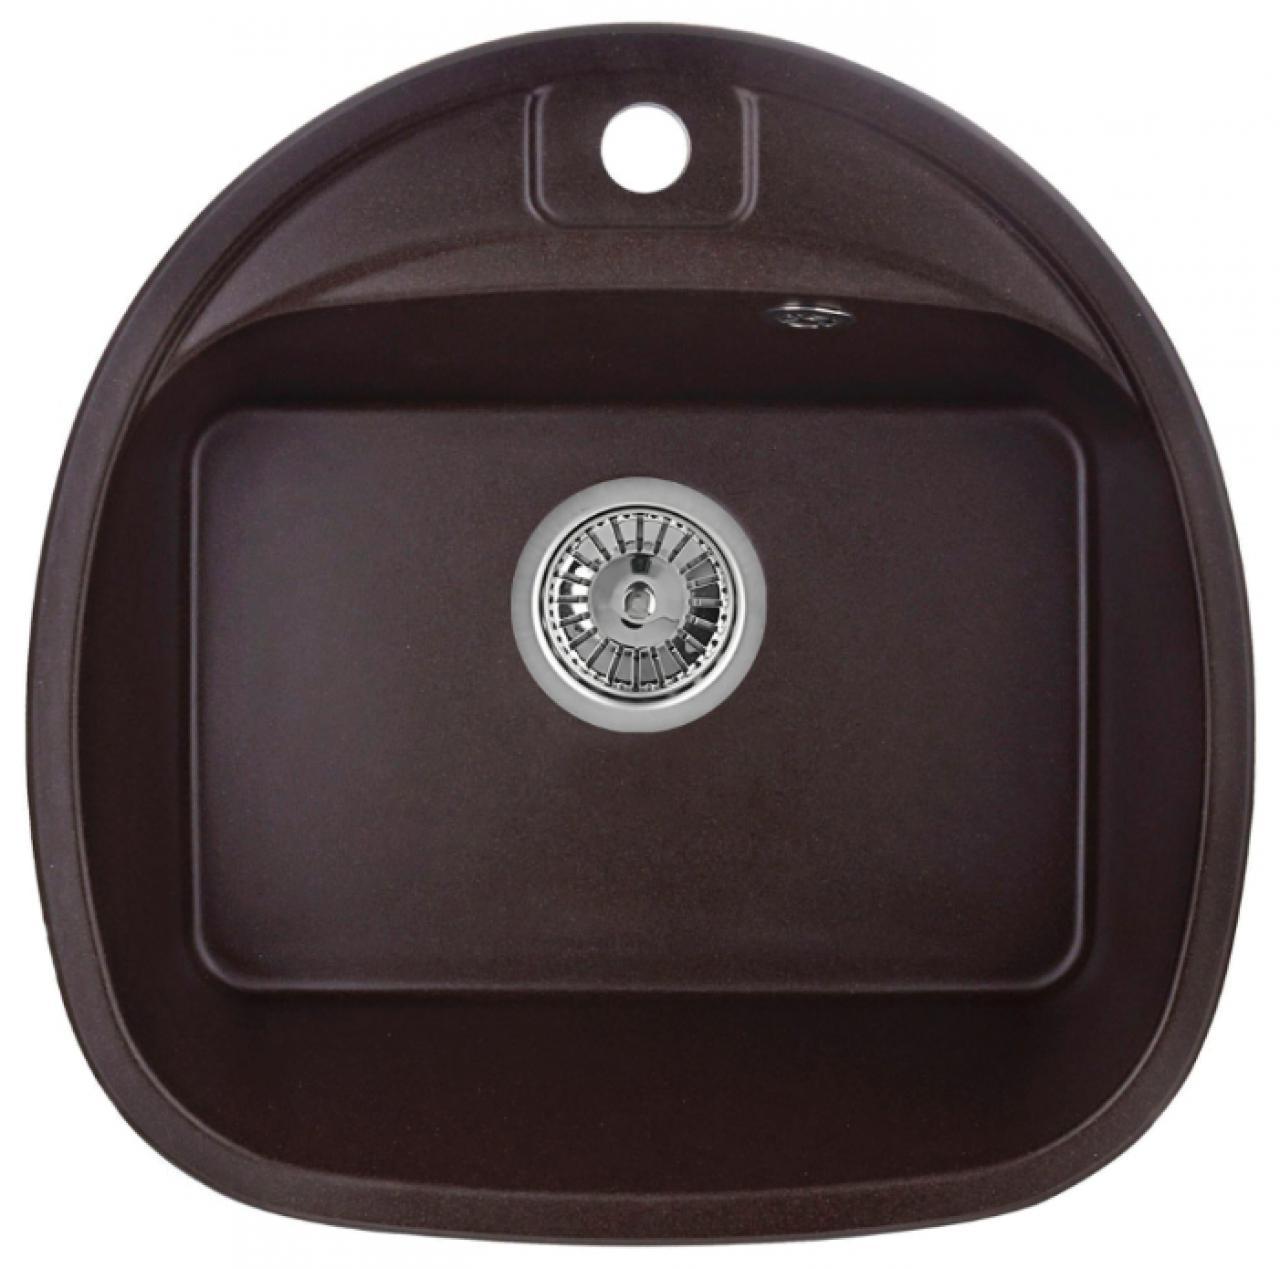 Кухонная мойка Weissgauff SOFTLINE 500 Eco Granit шоколад